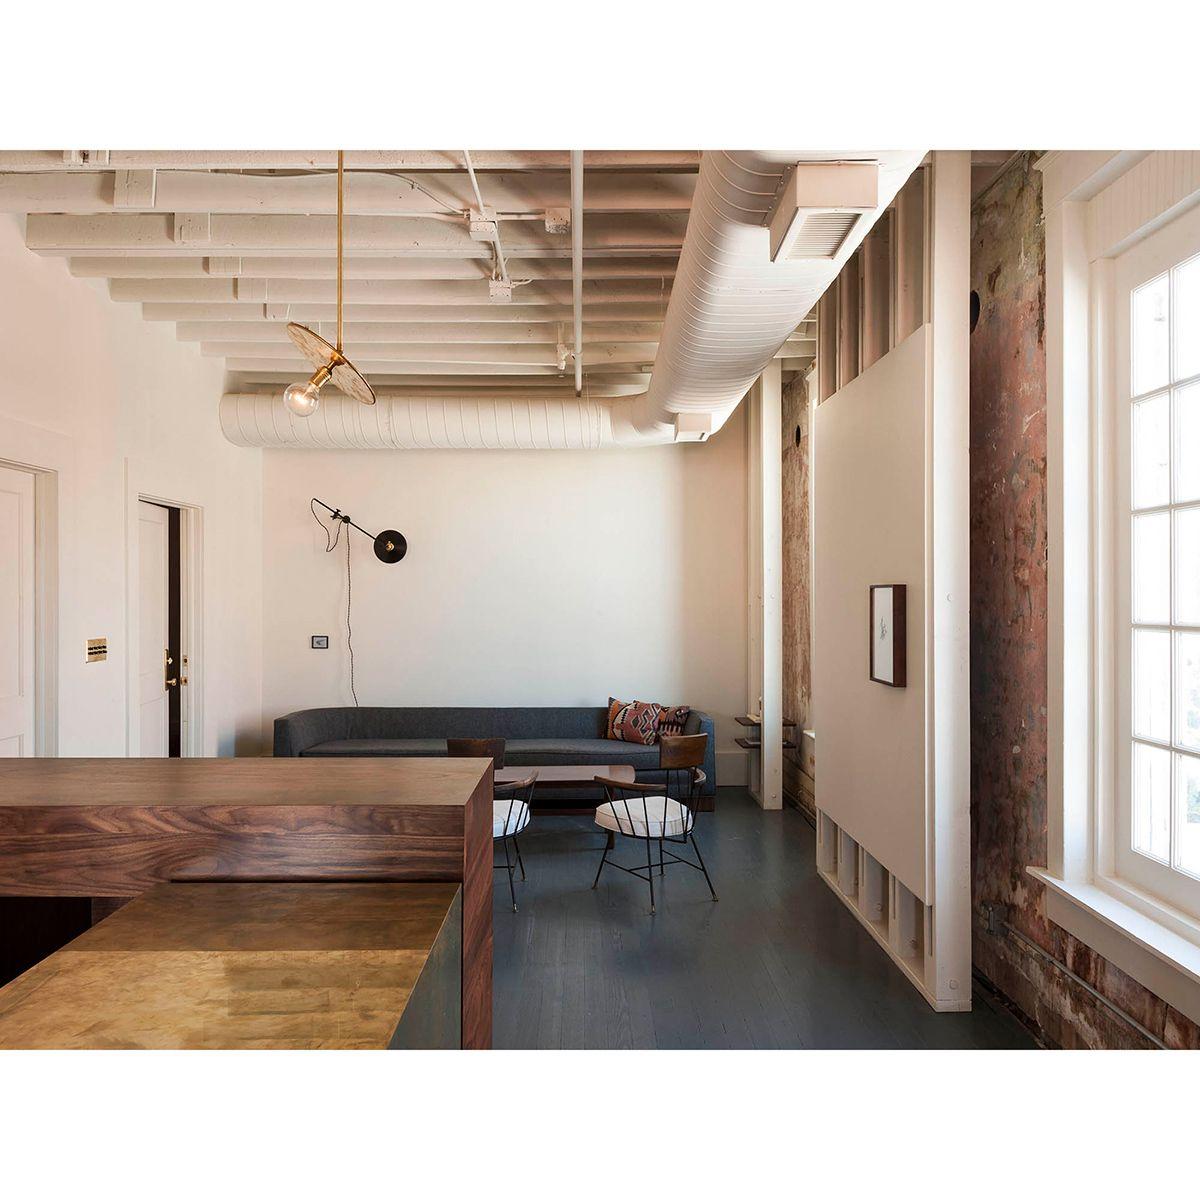 Workstead Pendant Brass in 2020 Home, Design, Interior